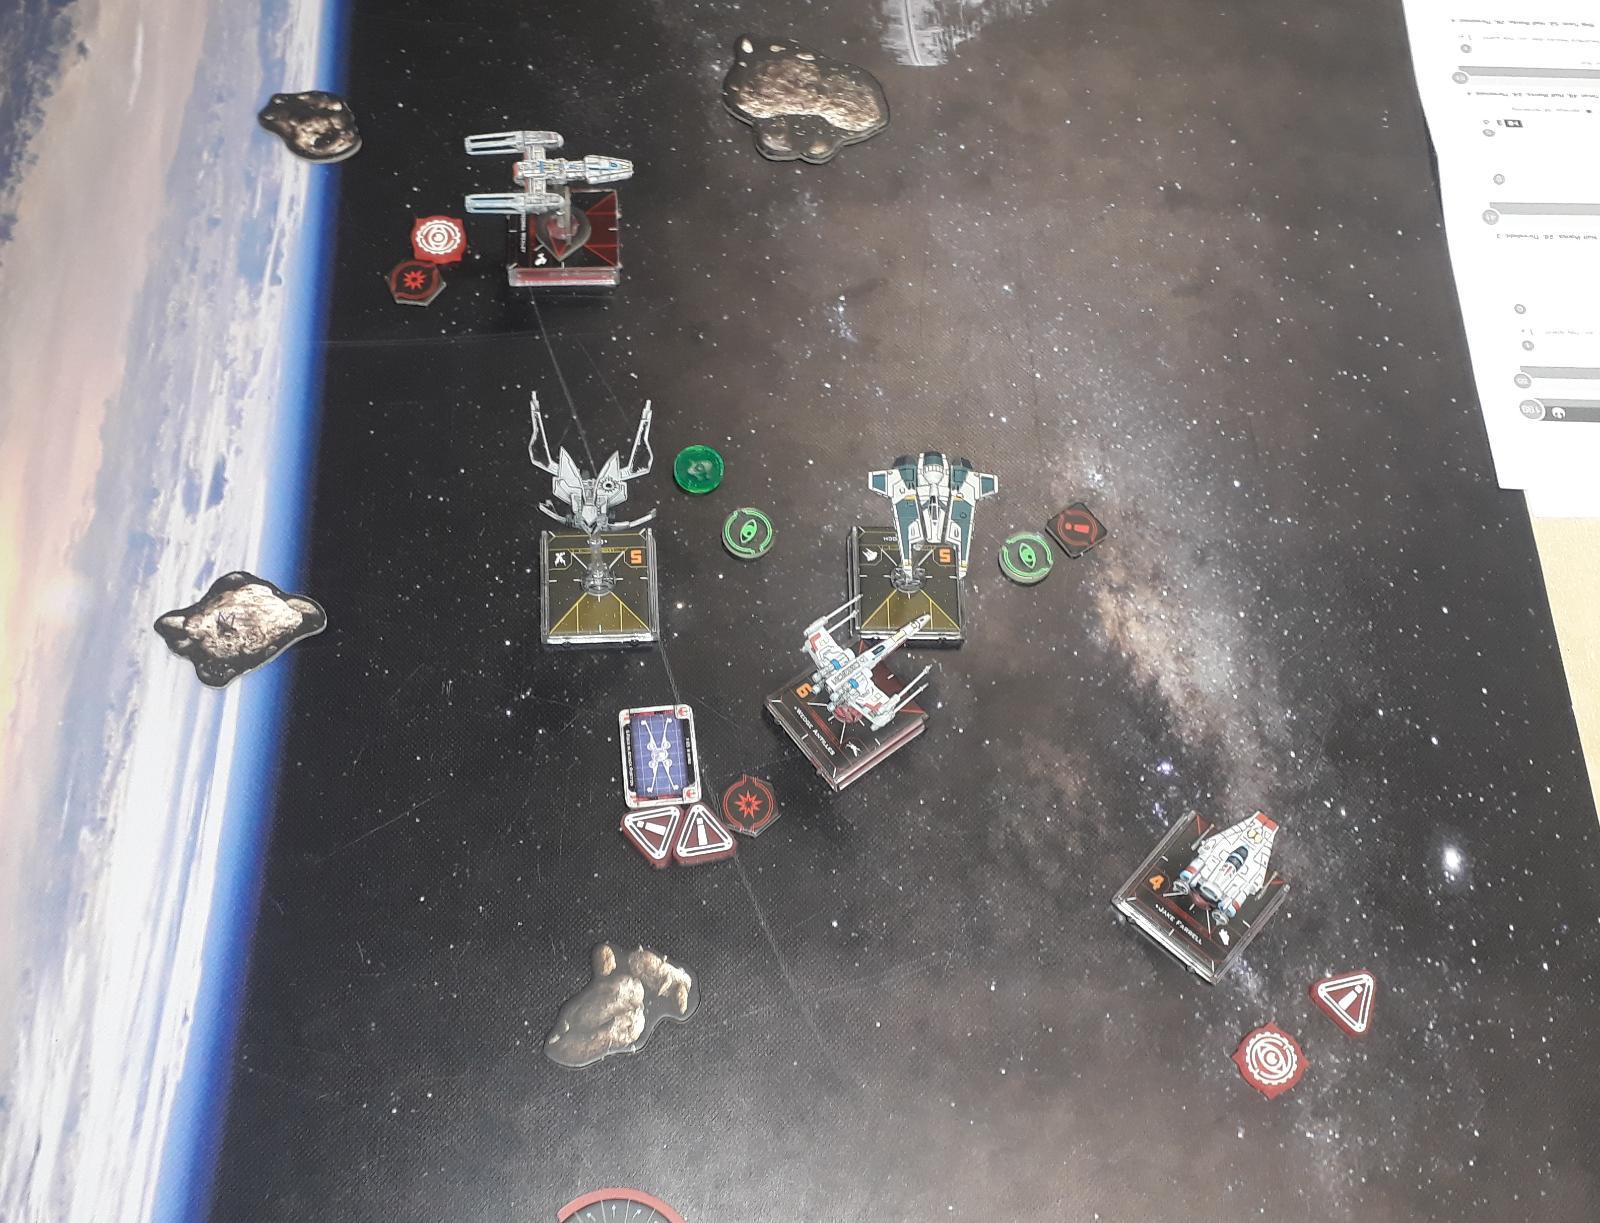 Rebellen in Bratislava - Hyperspace Zg4vbmac